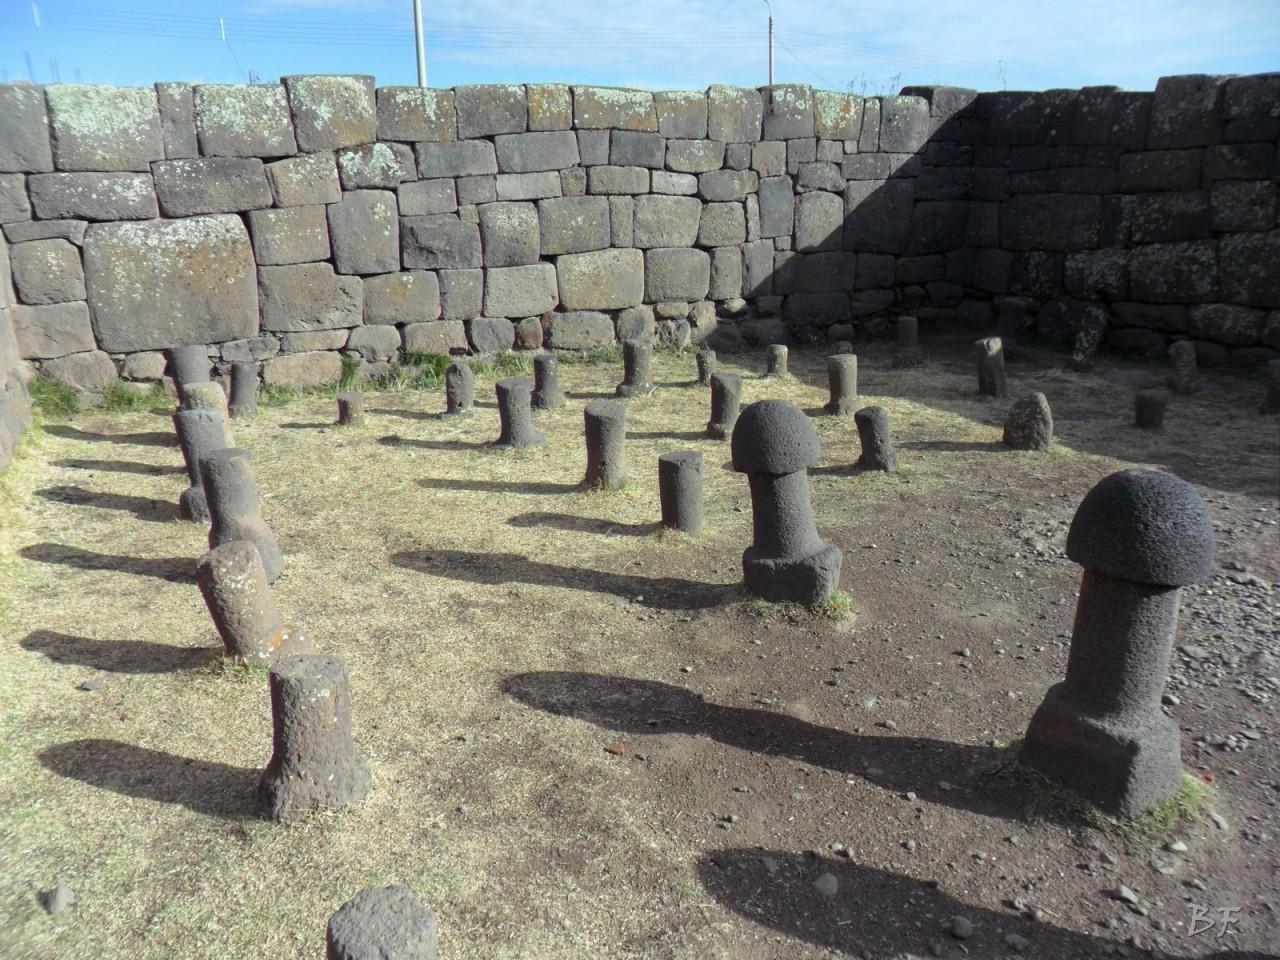 Mura-Poligonali-Megaliti-Inca-Uyo-Puno-Perù-16